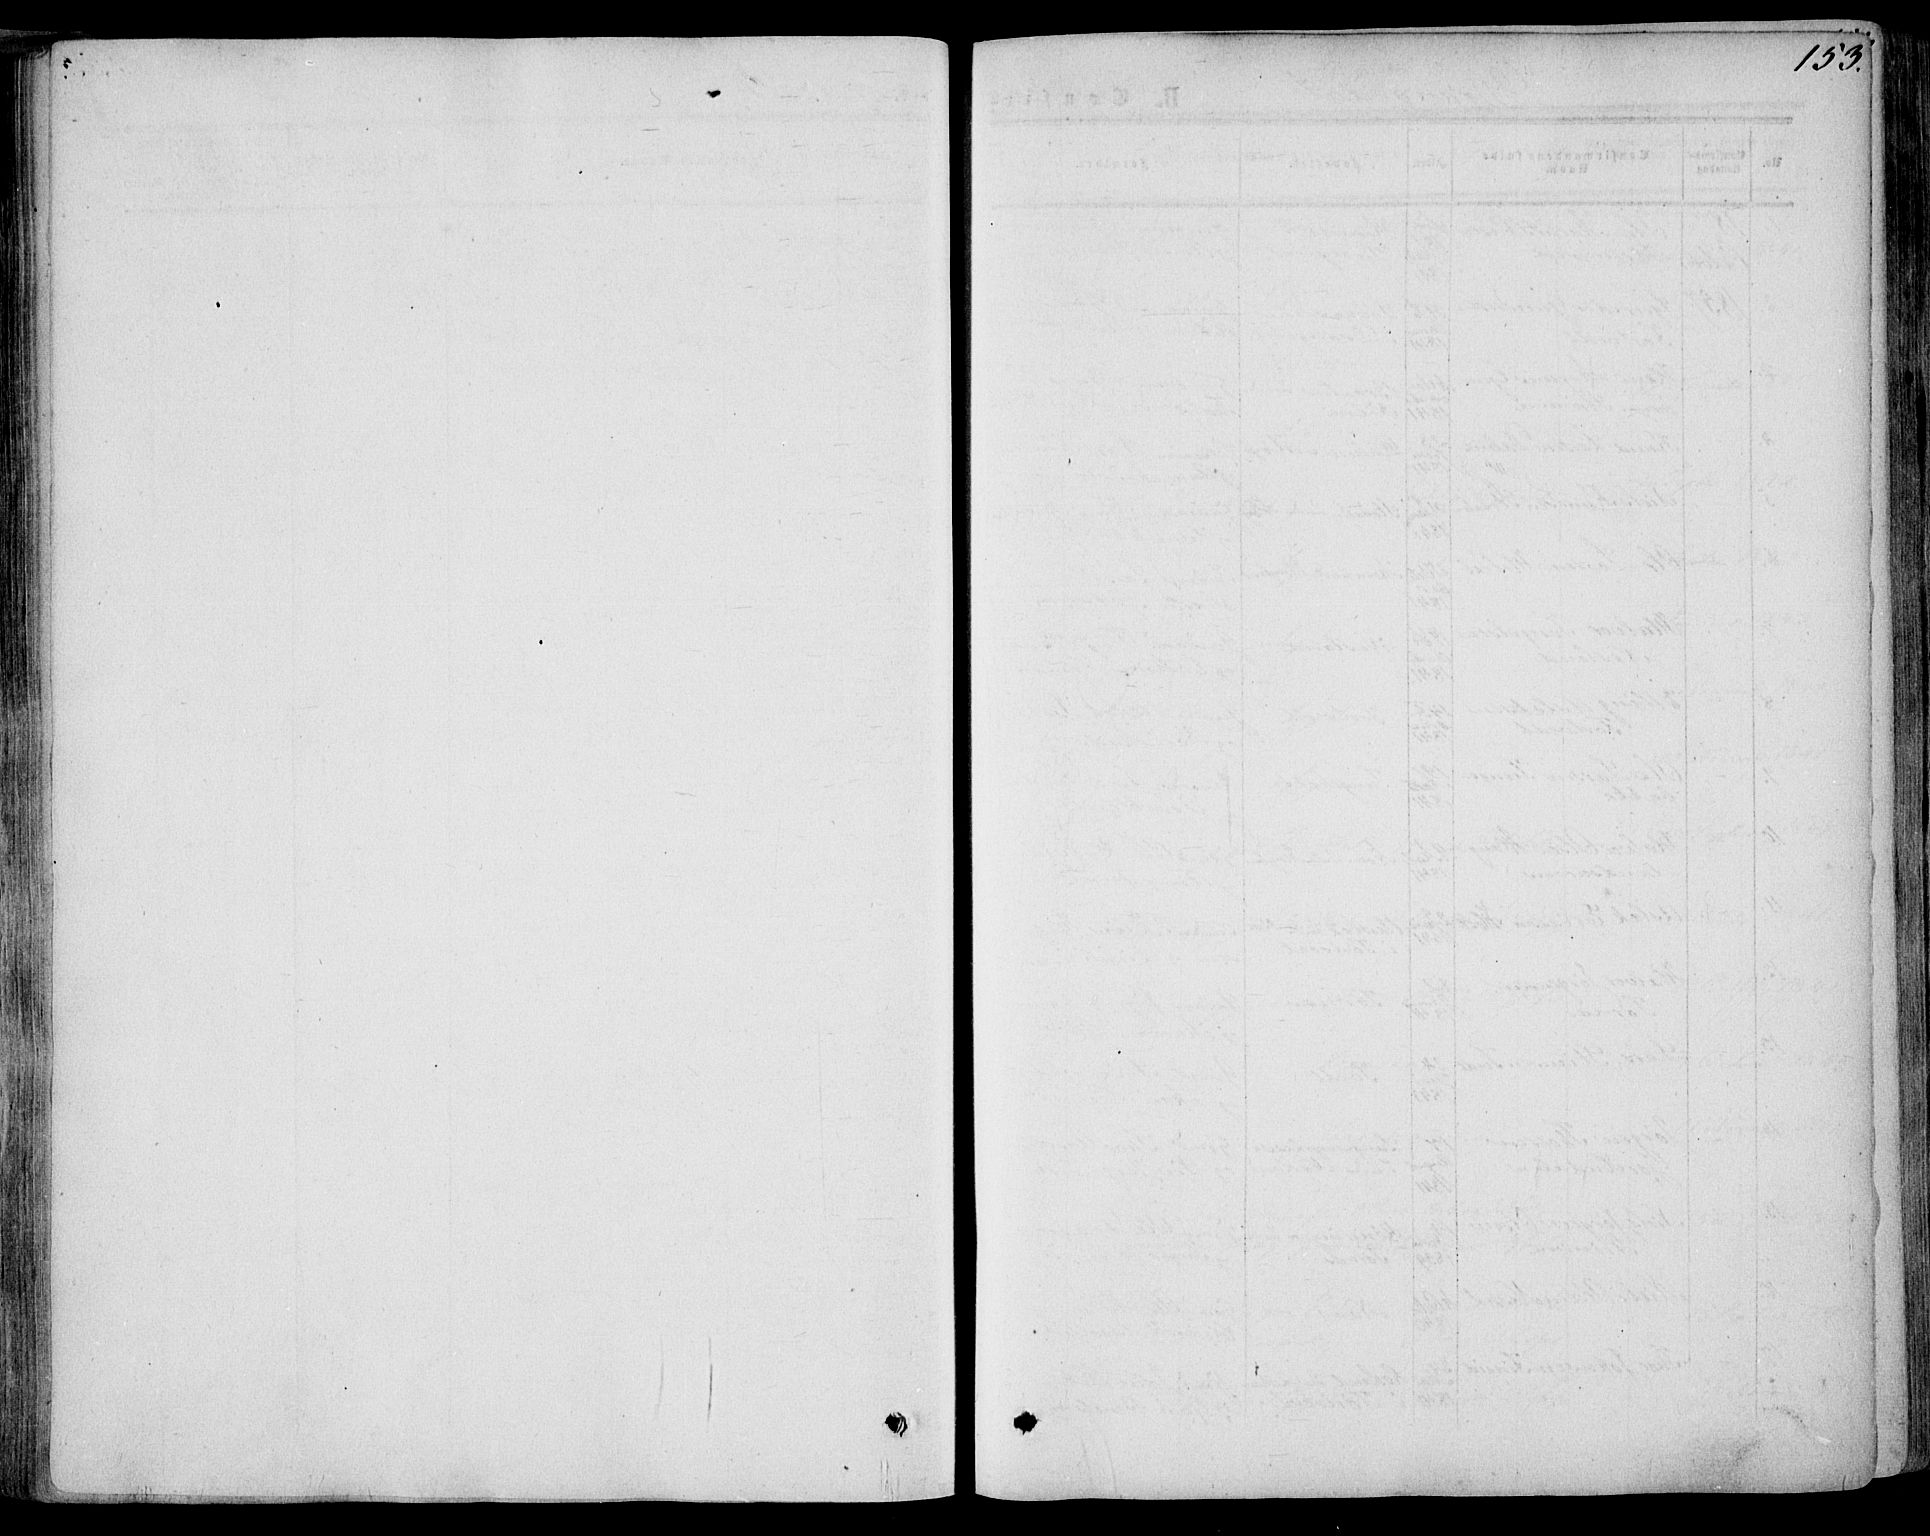 SAKO, Drangedal kirkebøker, F/Fa/L0008: Ministerialbok nr. 8, 1857-1871, s. 153